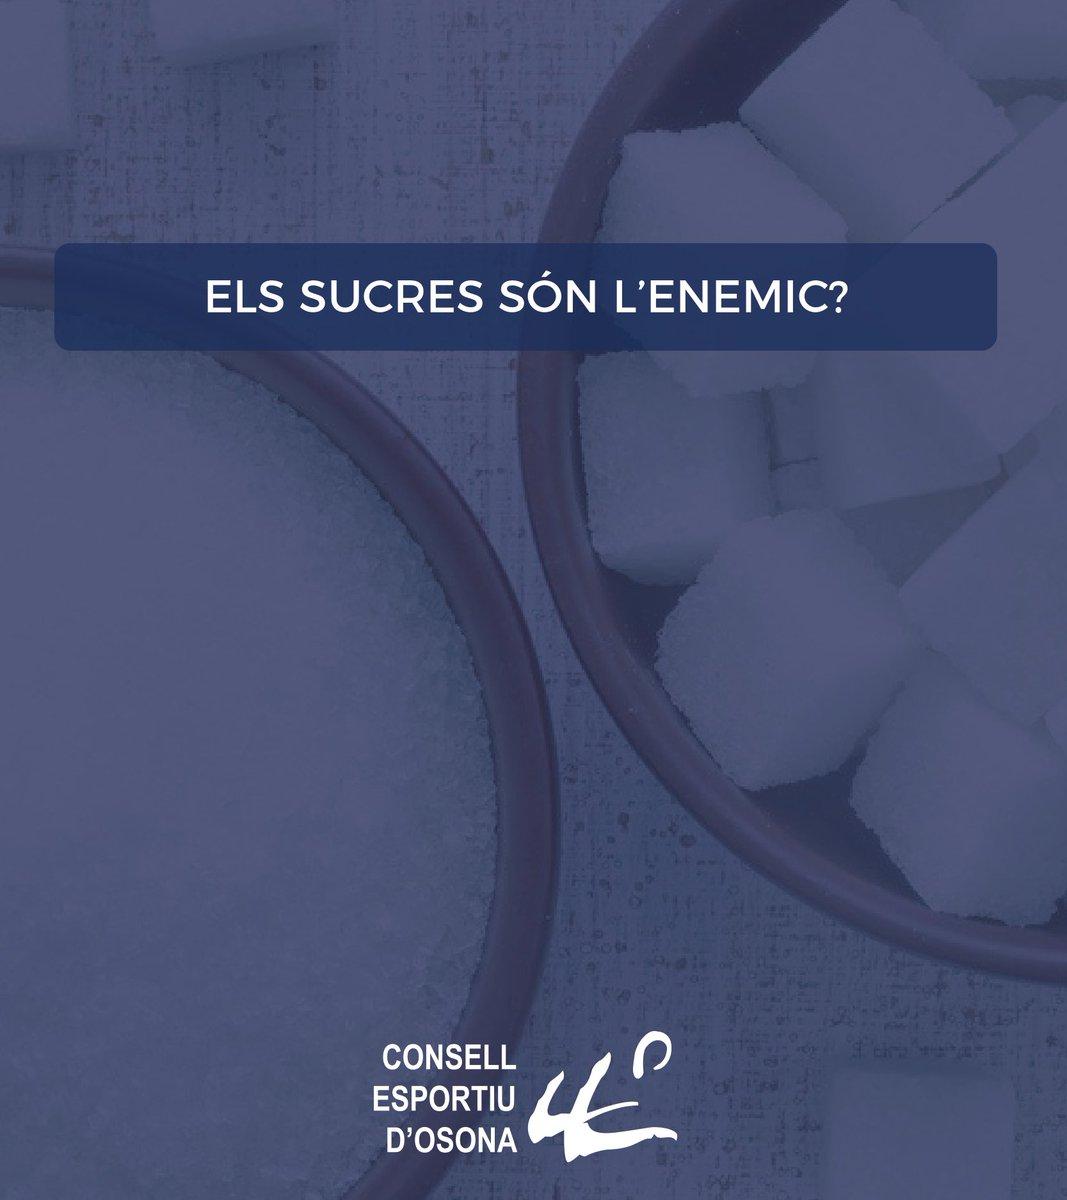 🧐 Els sucres són l'enemic? • #Alimentació #Entrenament #Córrer #Salut #Exercici #WorkOut #Running #Health #Fitness #Osona #Esport https://t.co/nfAwHAxbZU